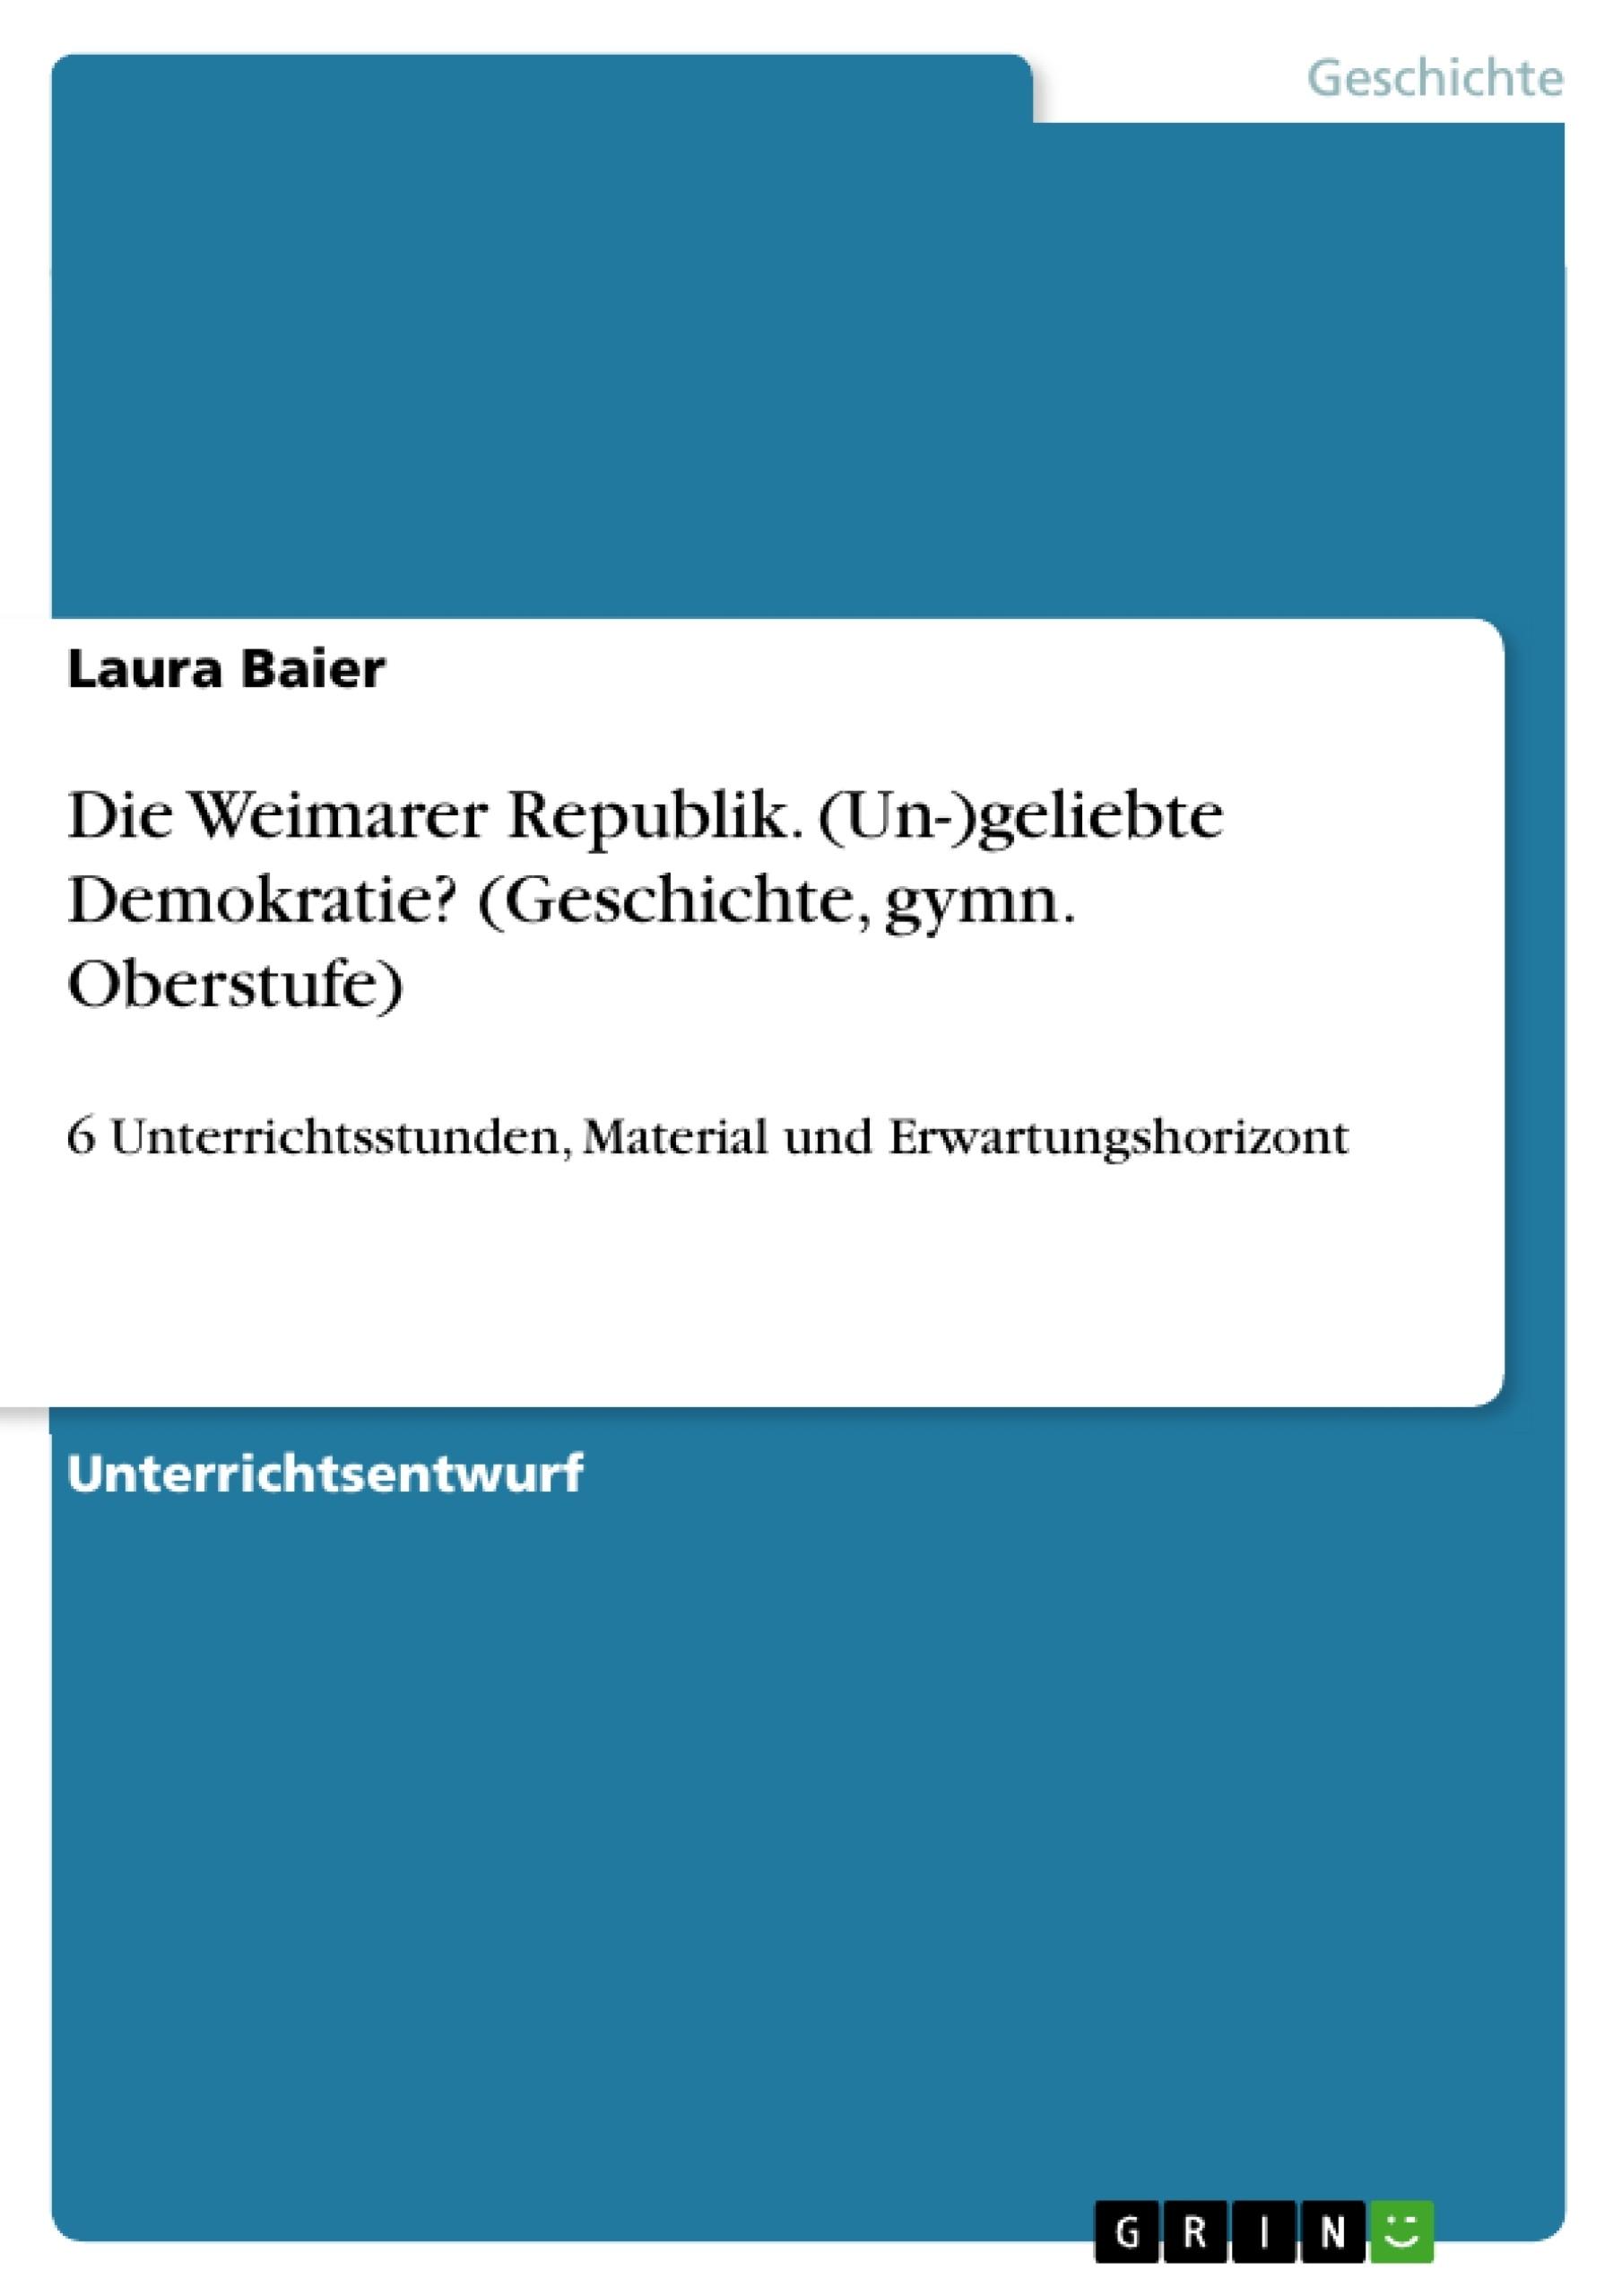 Titel: Die Weimarer Republik. (Un-)geliebte Demokratie? (Geschichte, gymn. Oberstufe)